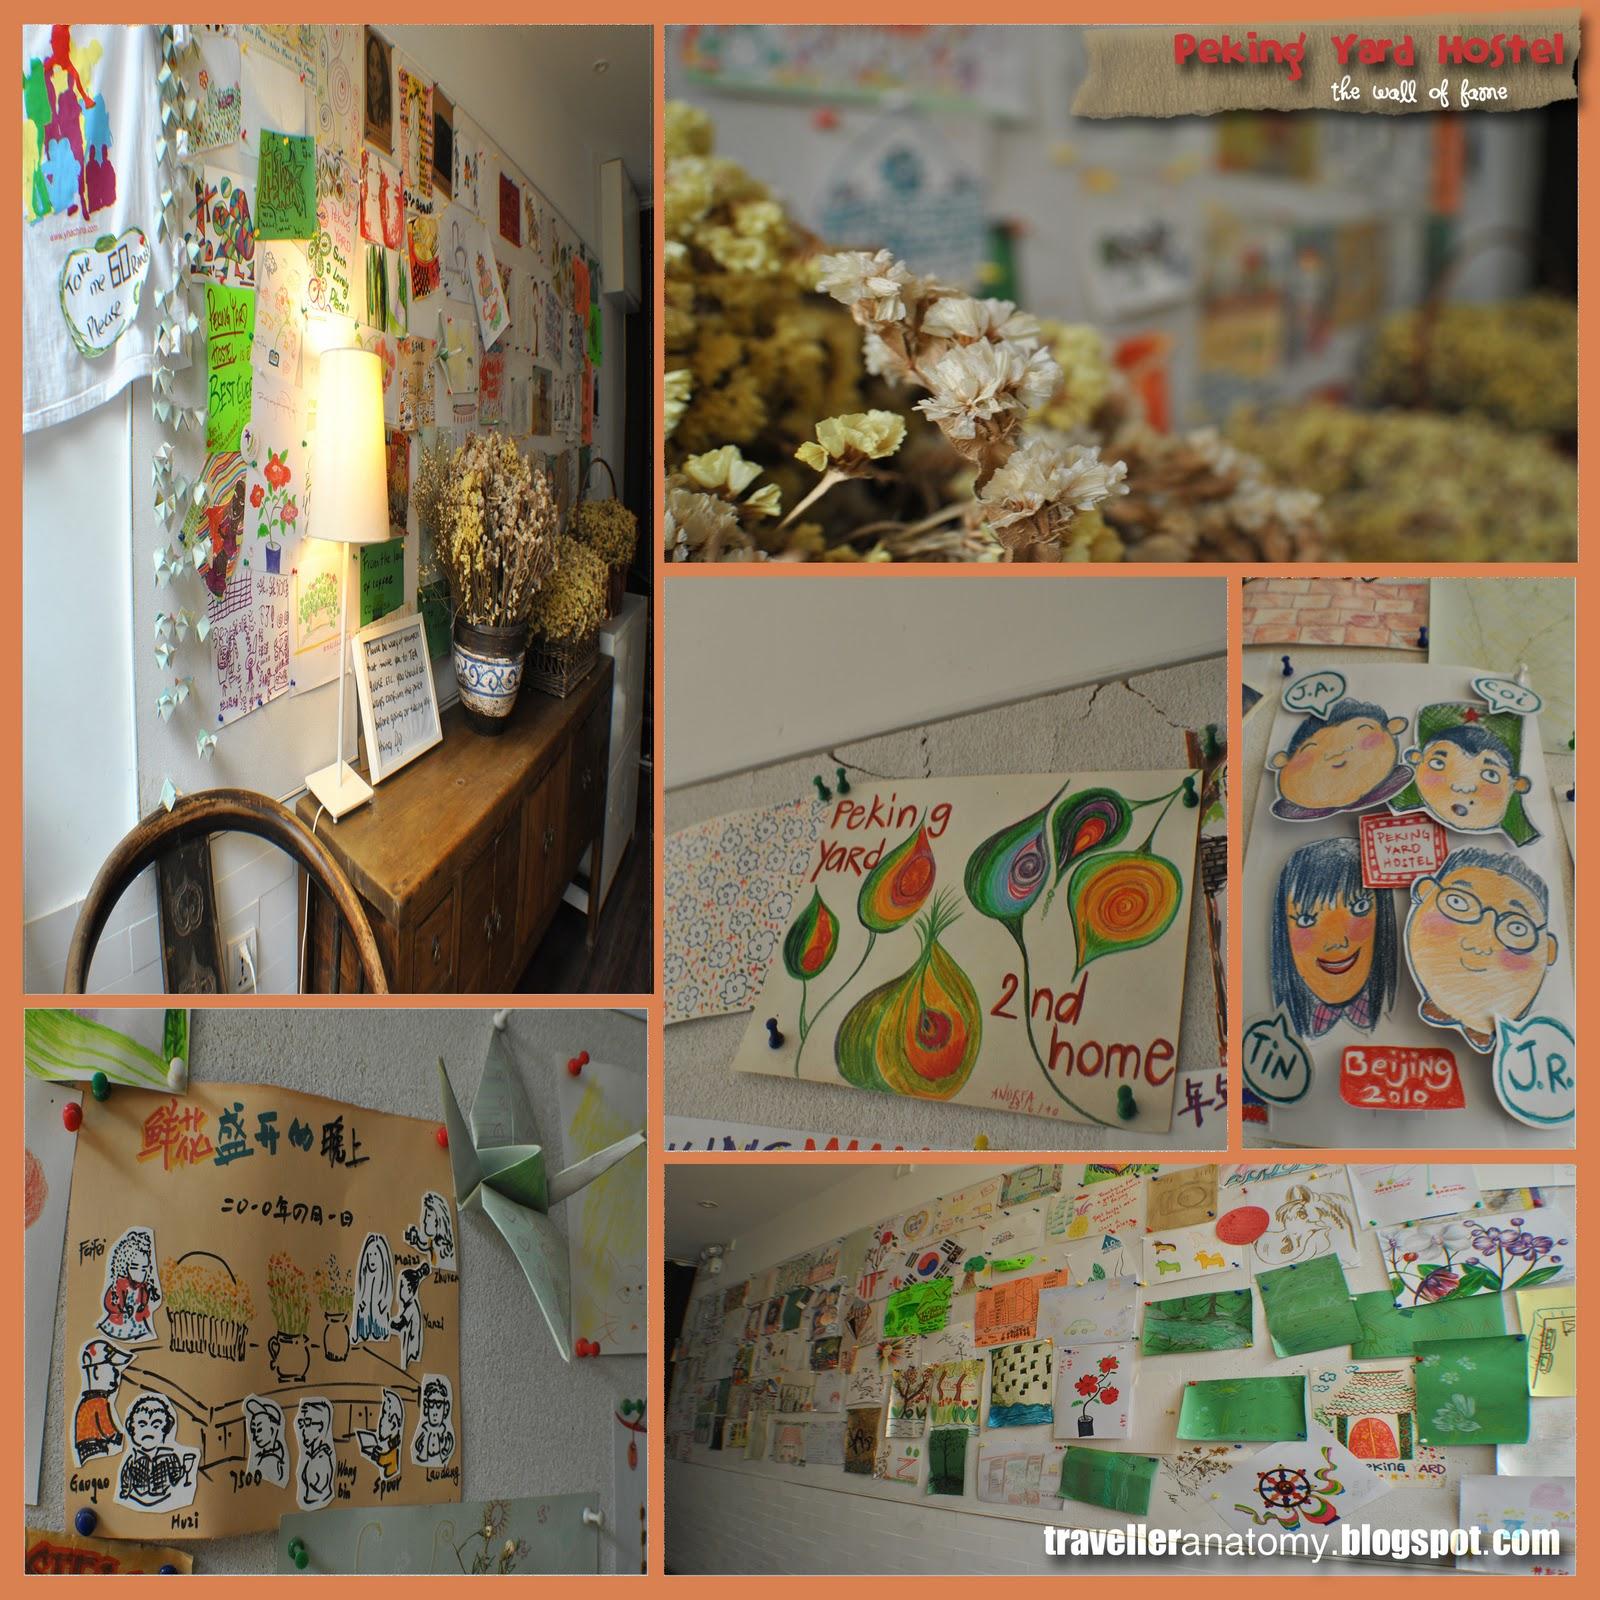 hostel life essay Essay on the hostel life or advantages and disadvantages of hostel life essay subject write an english essay on the hostel life essay in.